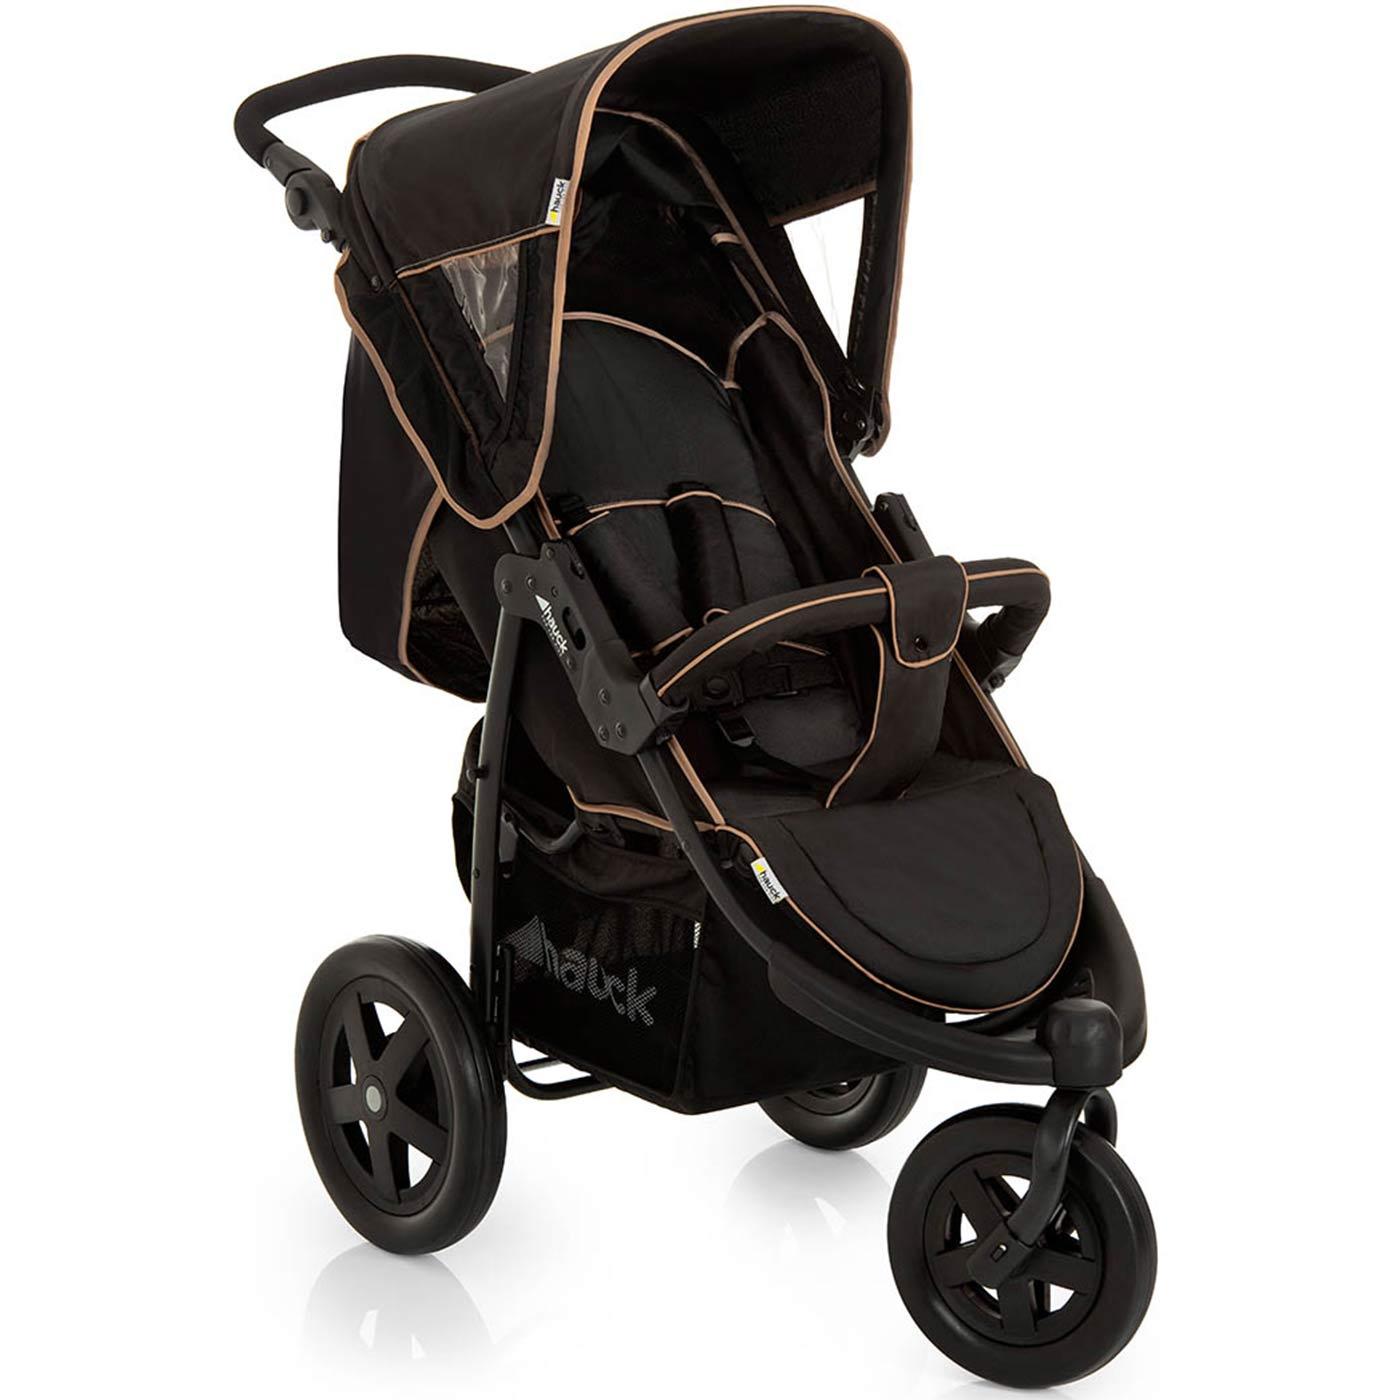 hauck viper trio set travel system baby toddler stroller pram car seat bn. Black Bedroom Furniture Sets. Home Design Ideas